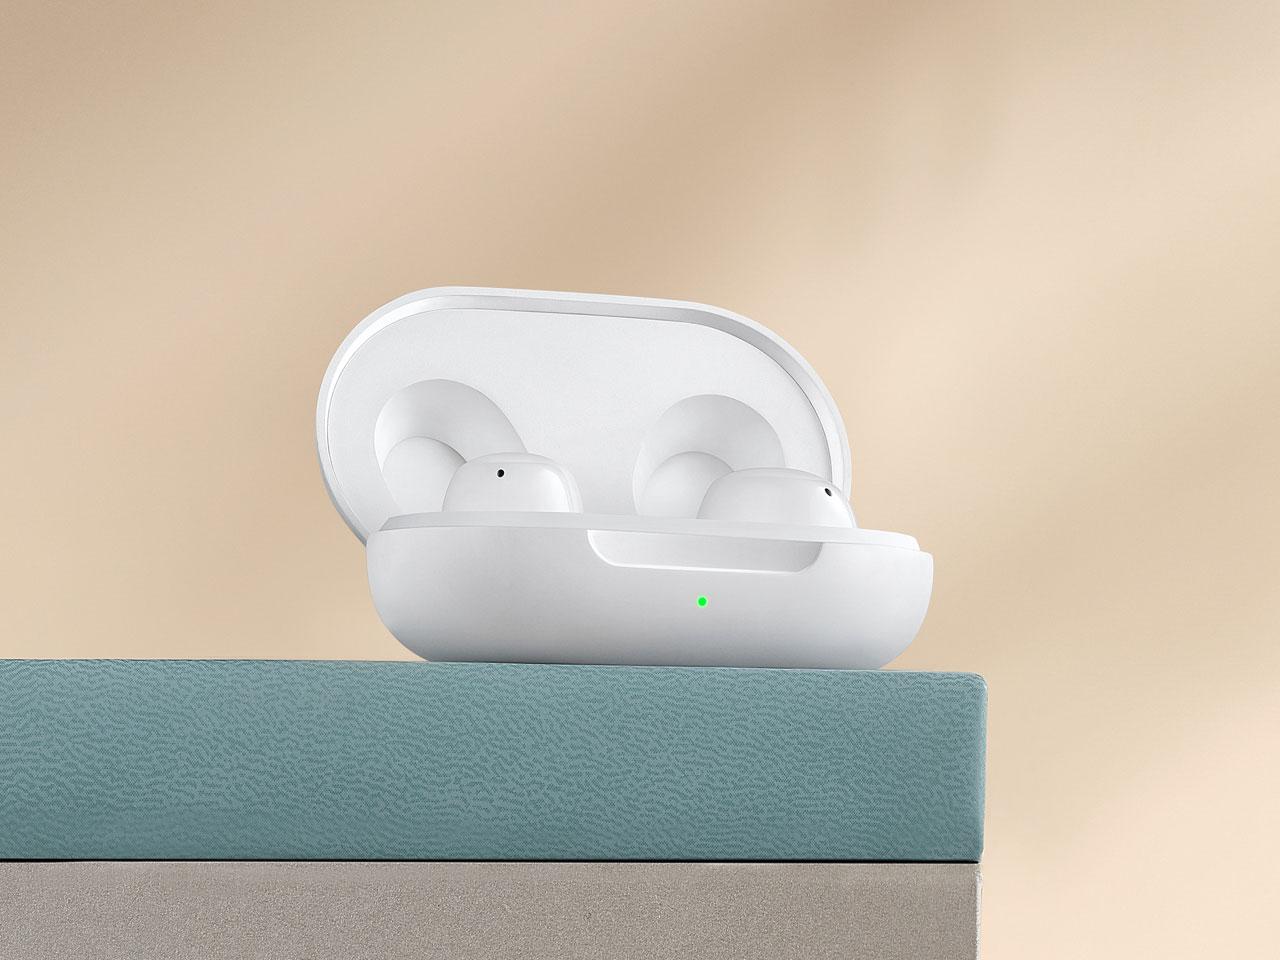 OPPO Enco Buds Compact-Designed White